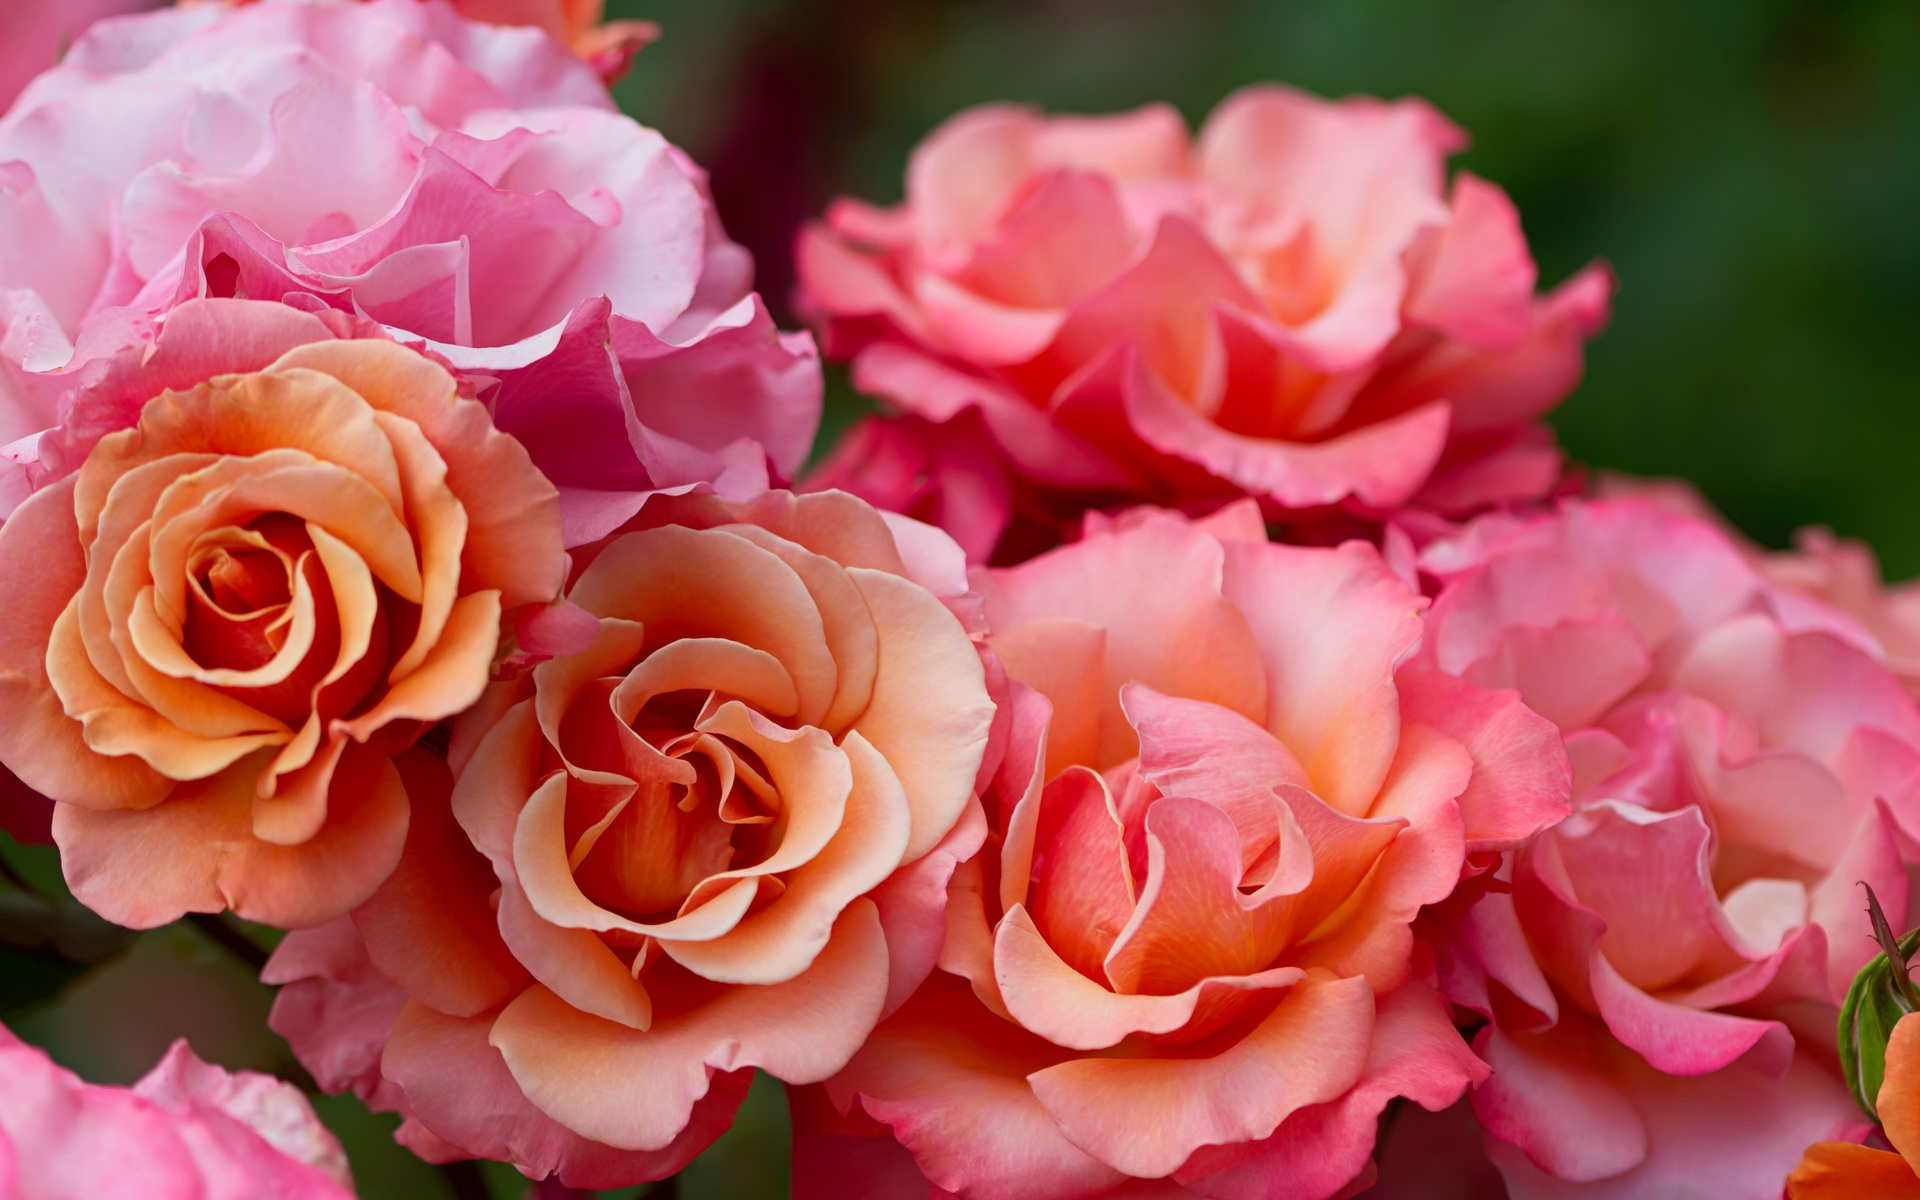 Beautiful Flower Garden 배경 화면 분홍색 장미 꽃 매크로 촬영 1920x1200 Hd 그림 이미지